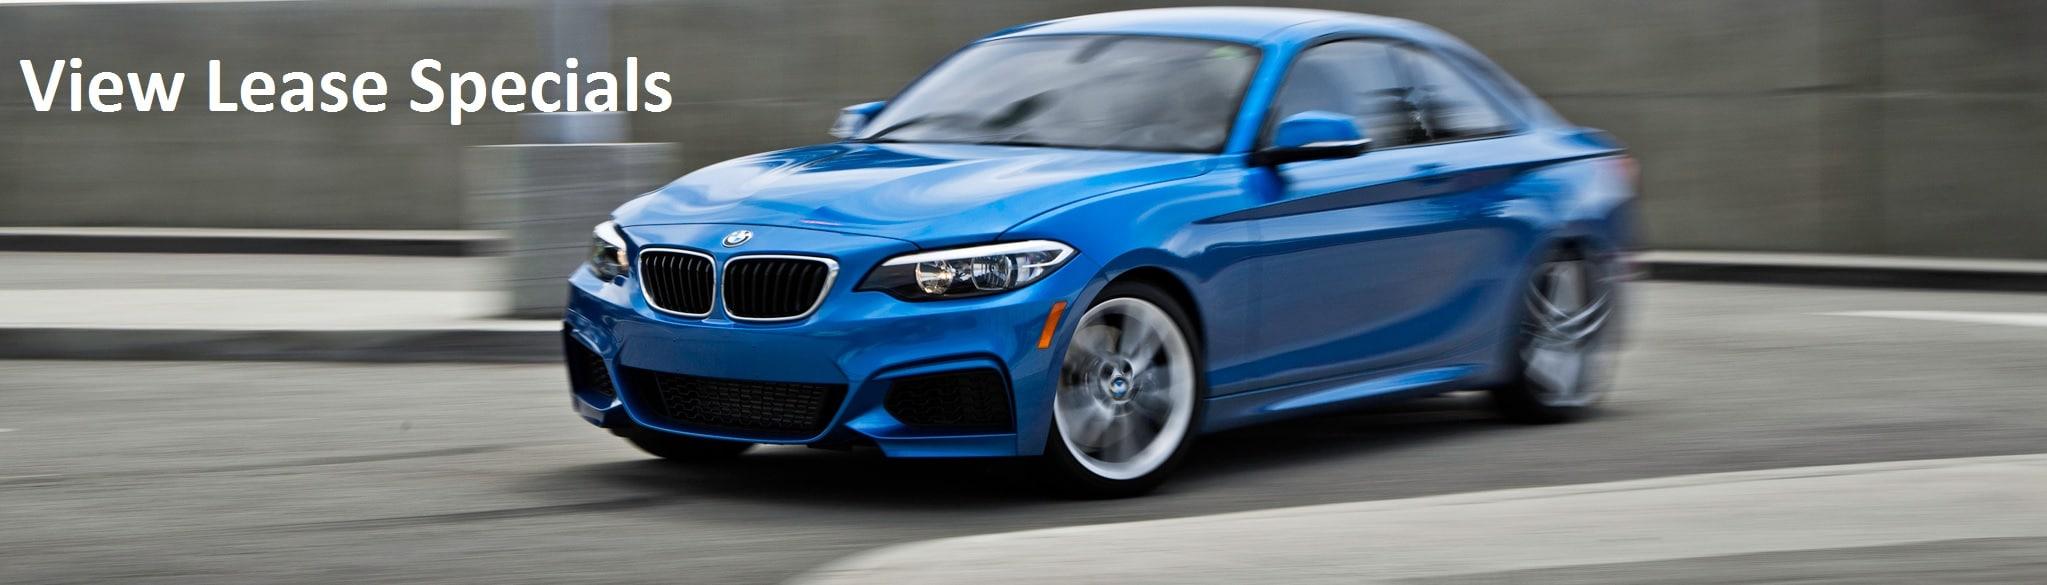 Buy or Lease BMW 2Series Los Angeles Thousand Oaks Westlake